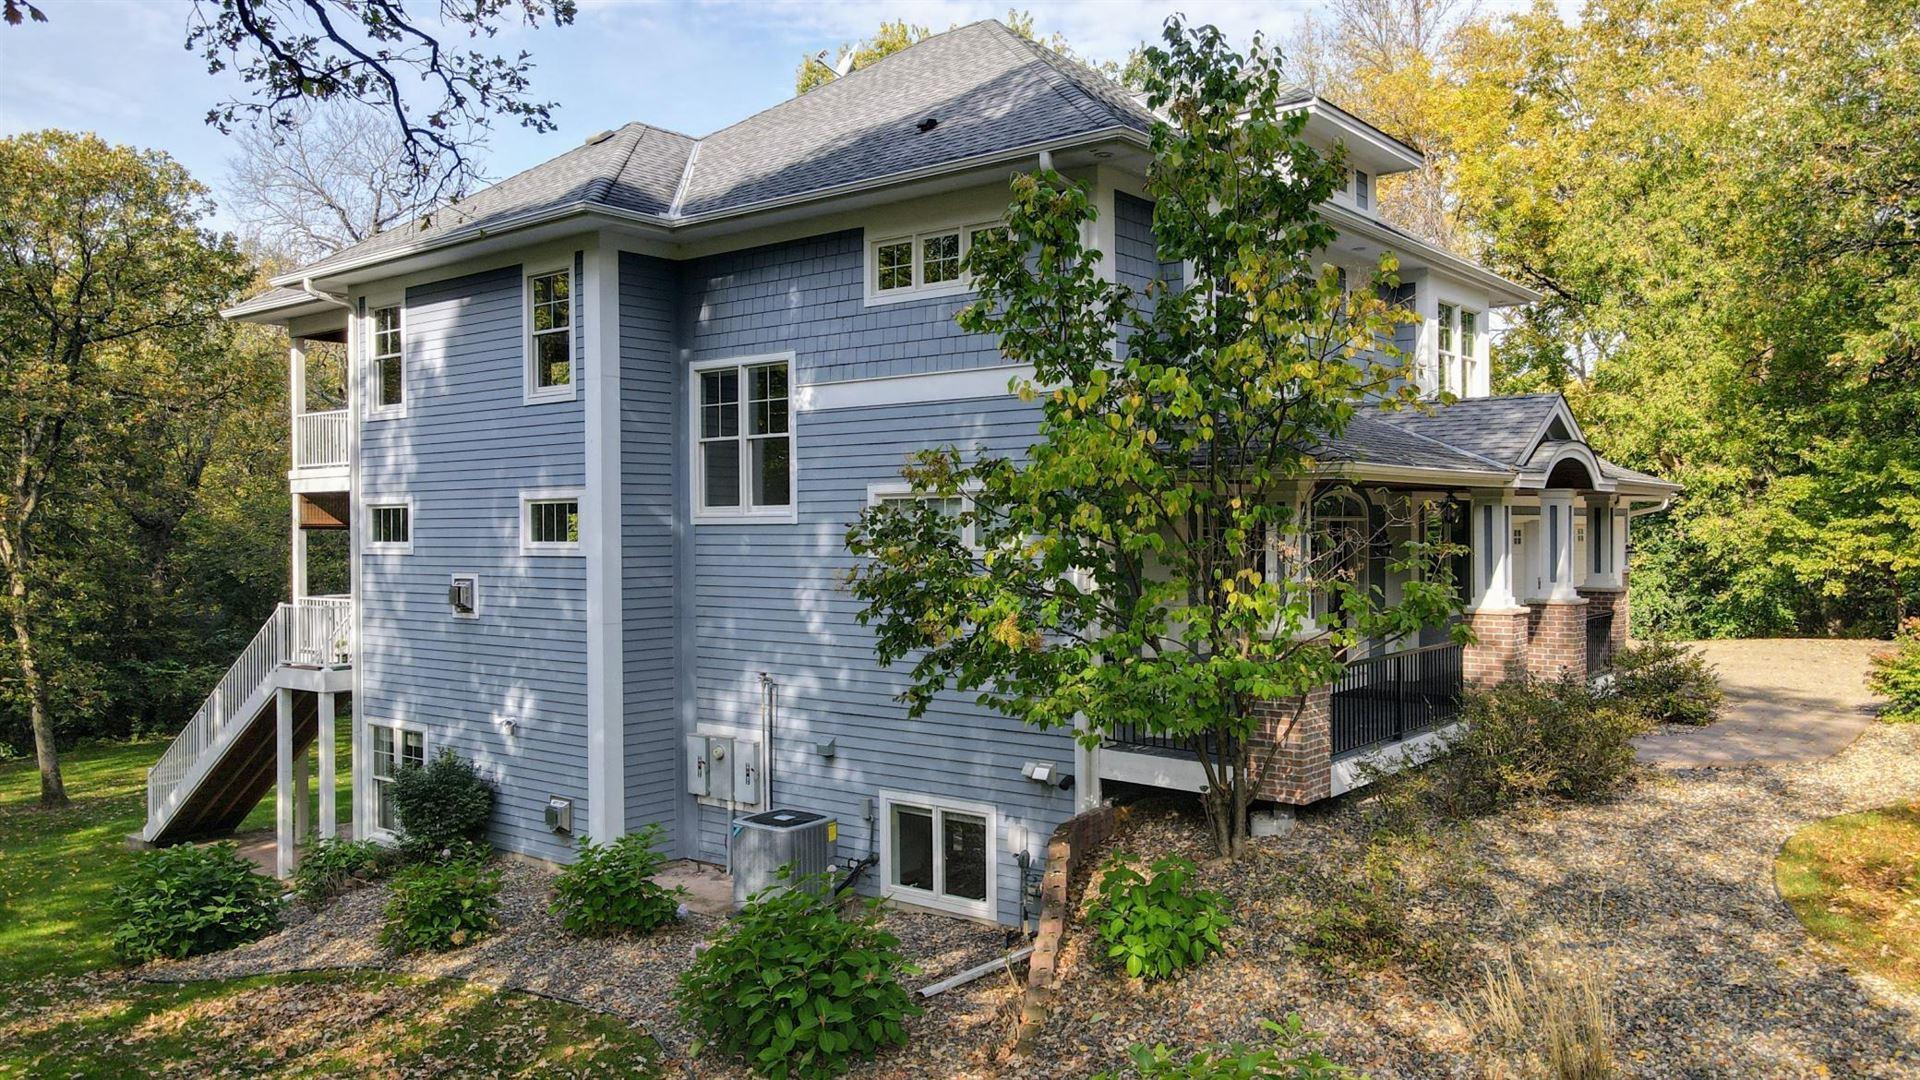 Photo of 6620 Lamar Avenue S, Cottage Grove, MN 55016 (MLS # 6104837)